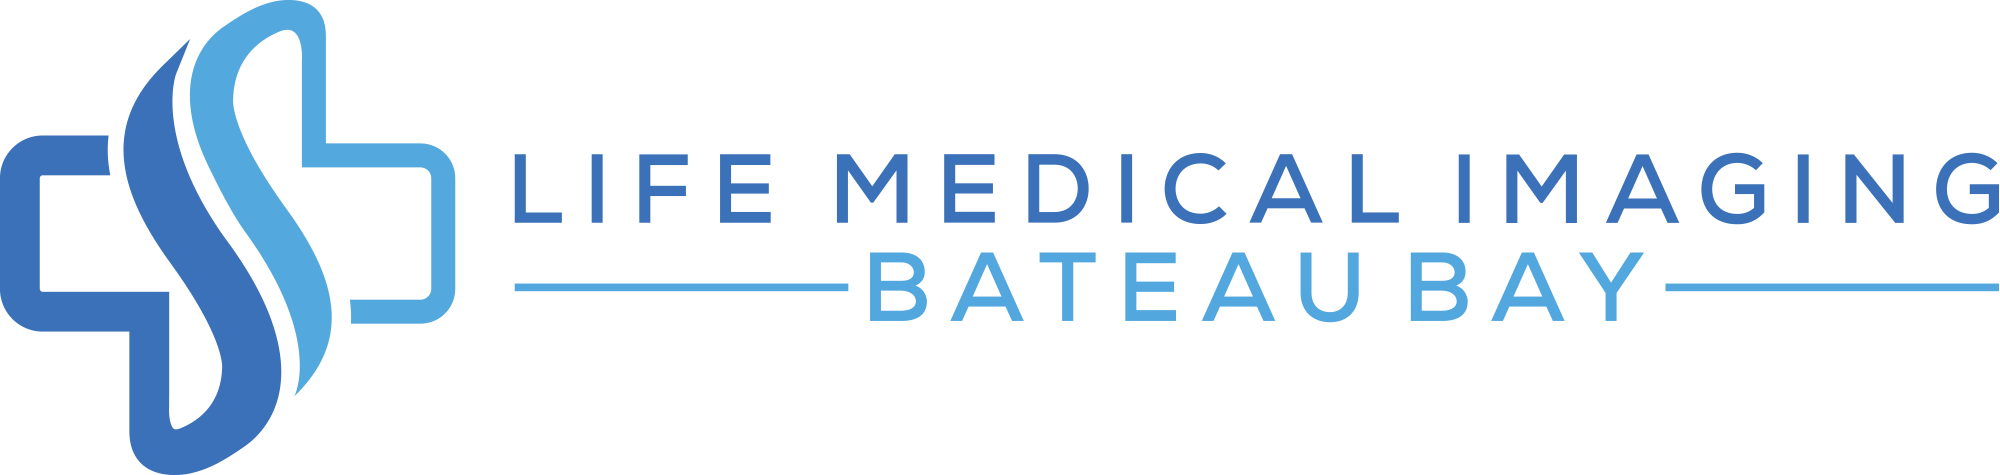 Life Medical Imaging - Bateau Bay Bateau Bay (02) 4326 7000